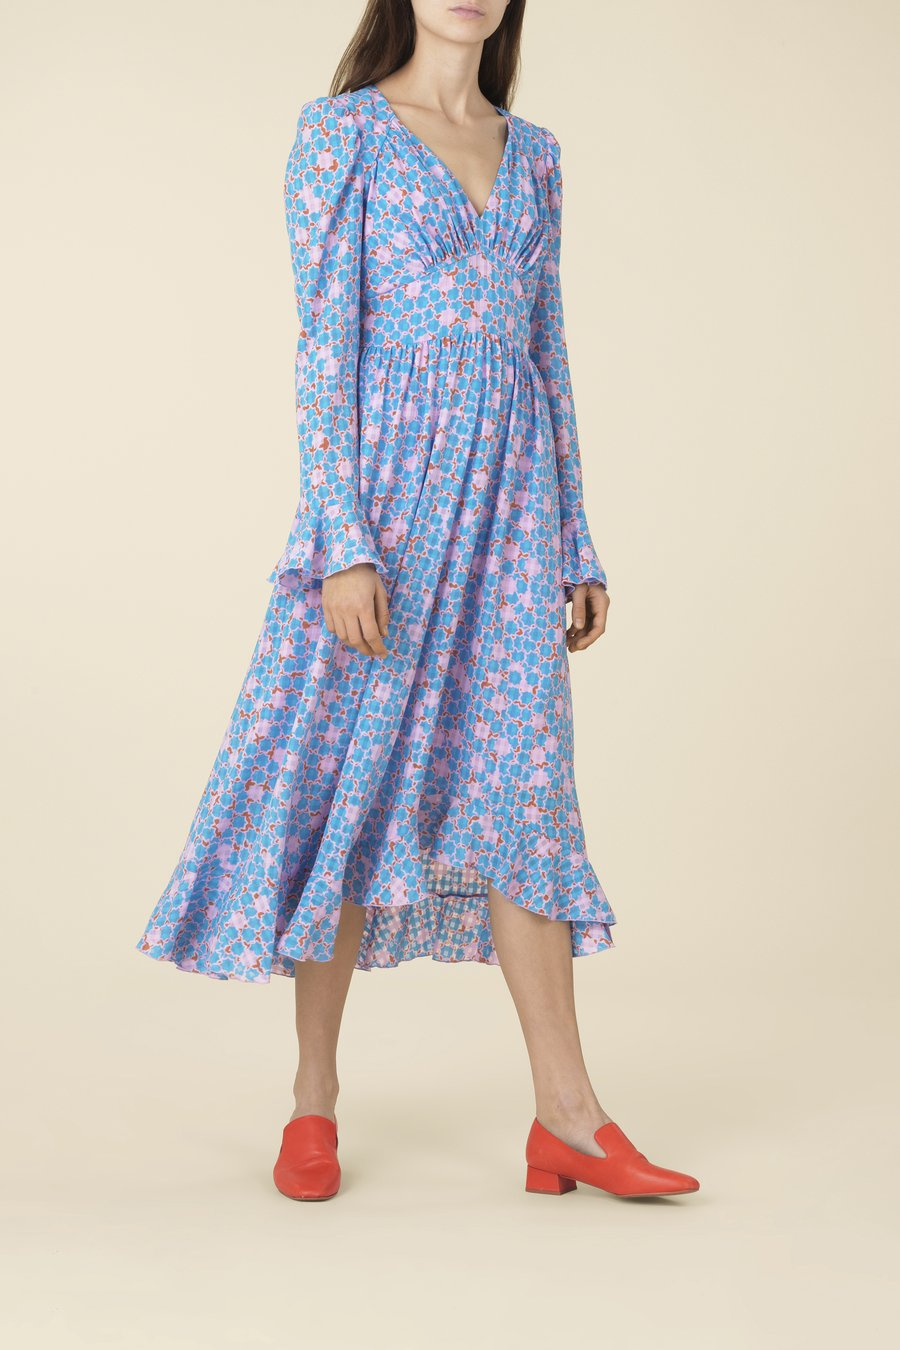 Freesia_Dress-Dress-SG2308-1507_Stardot_900x.jpg